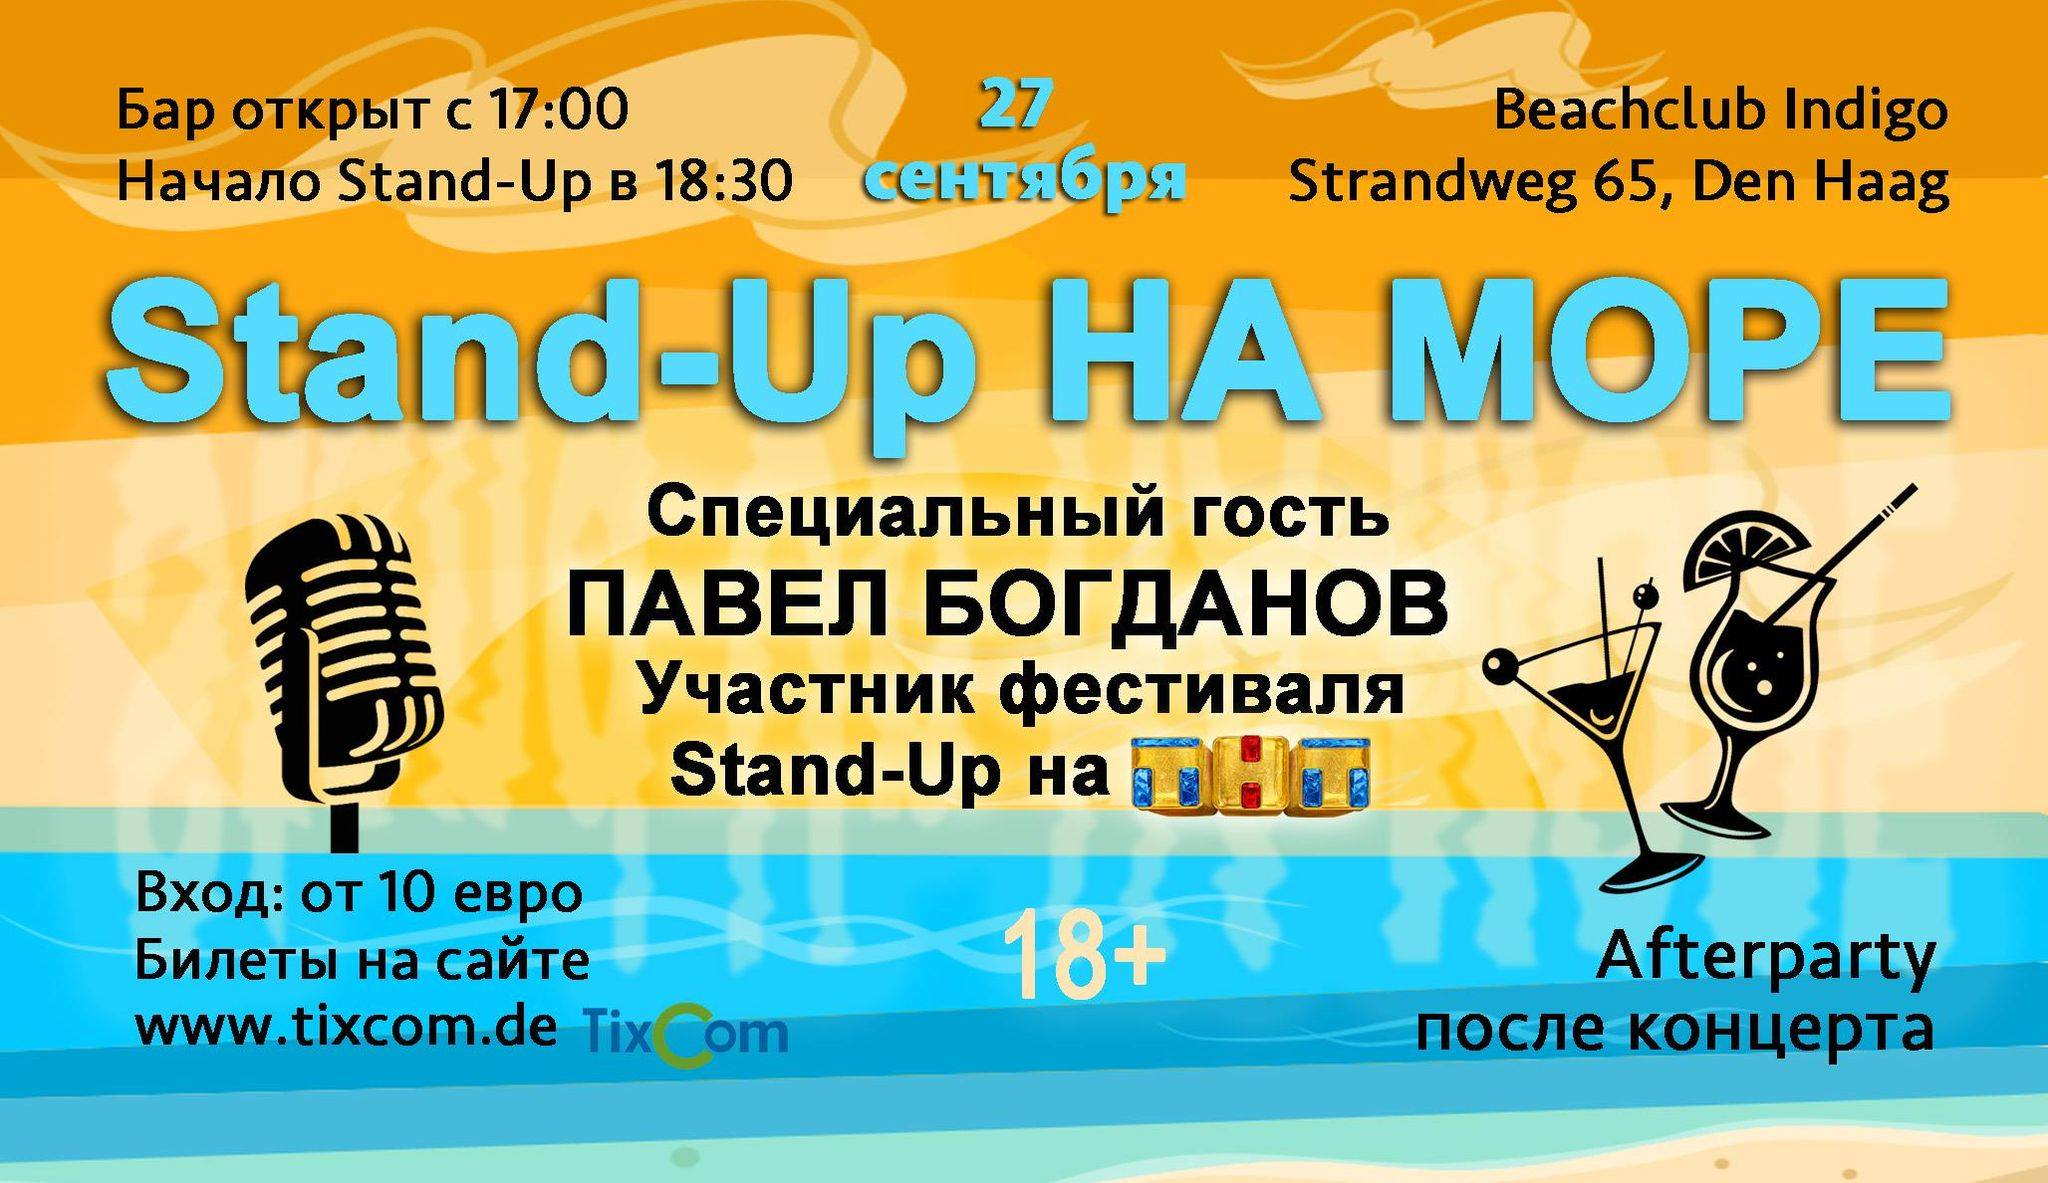 27 сентября – Stand-Up вечеринка в Гааге на море